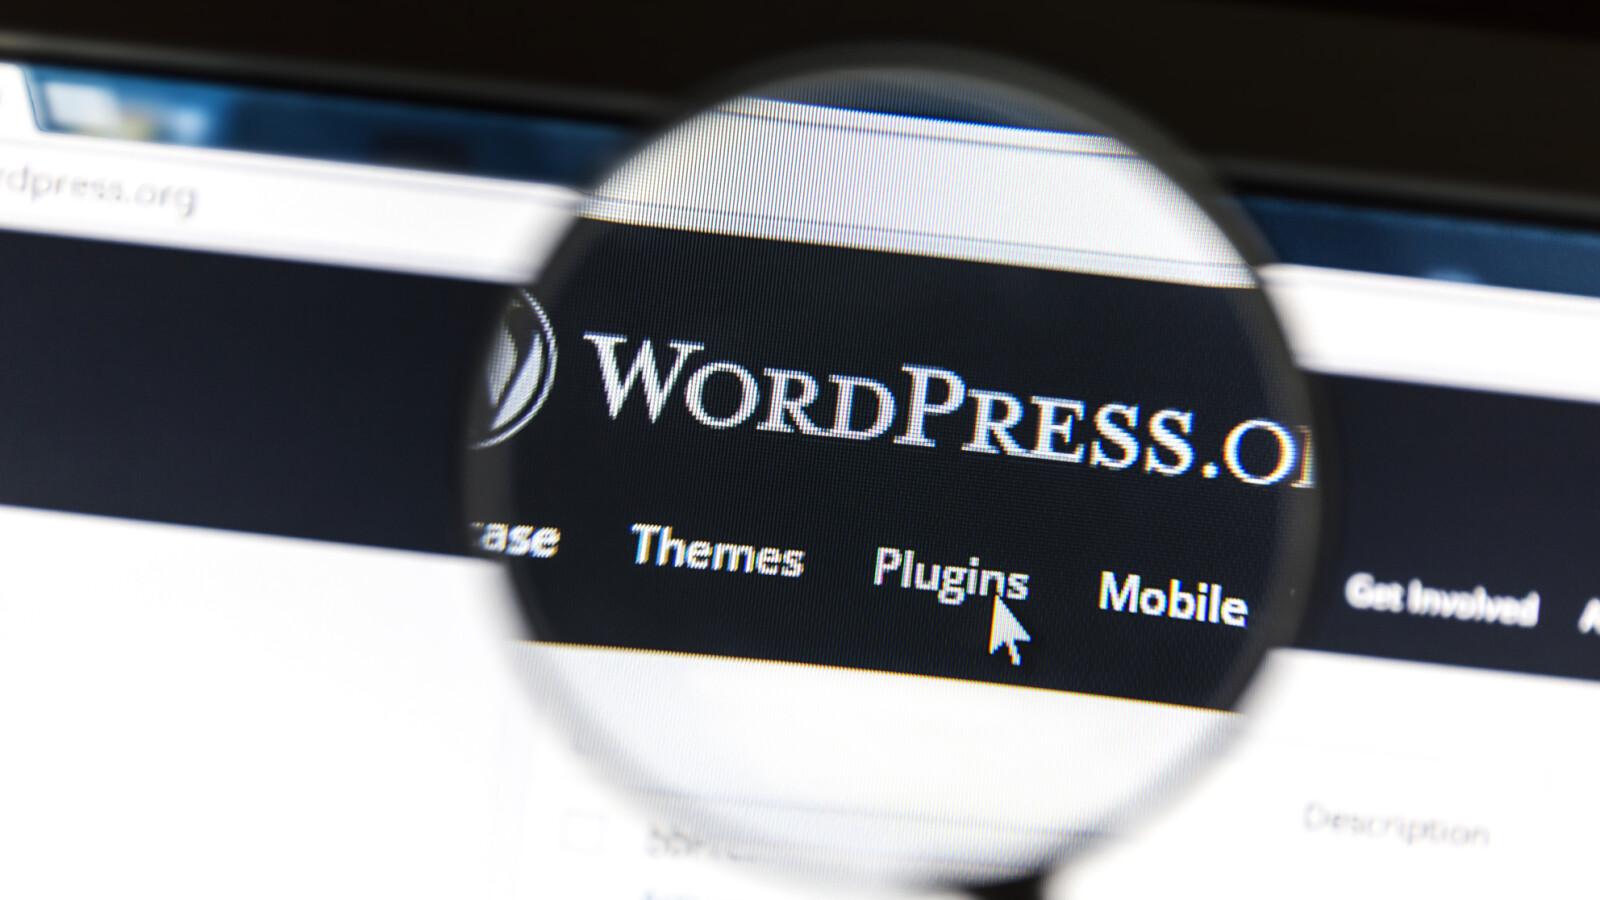 wordpress dsgvo plugin